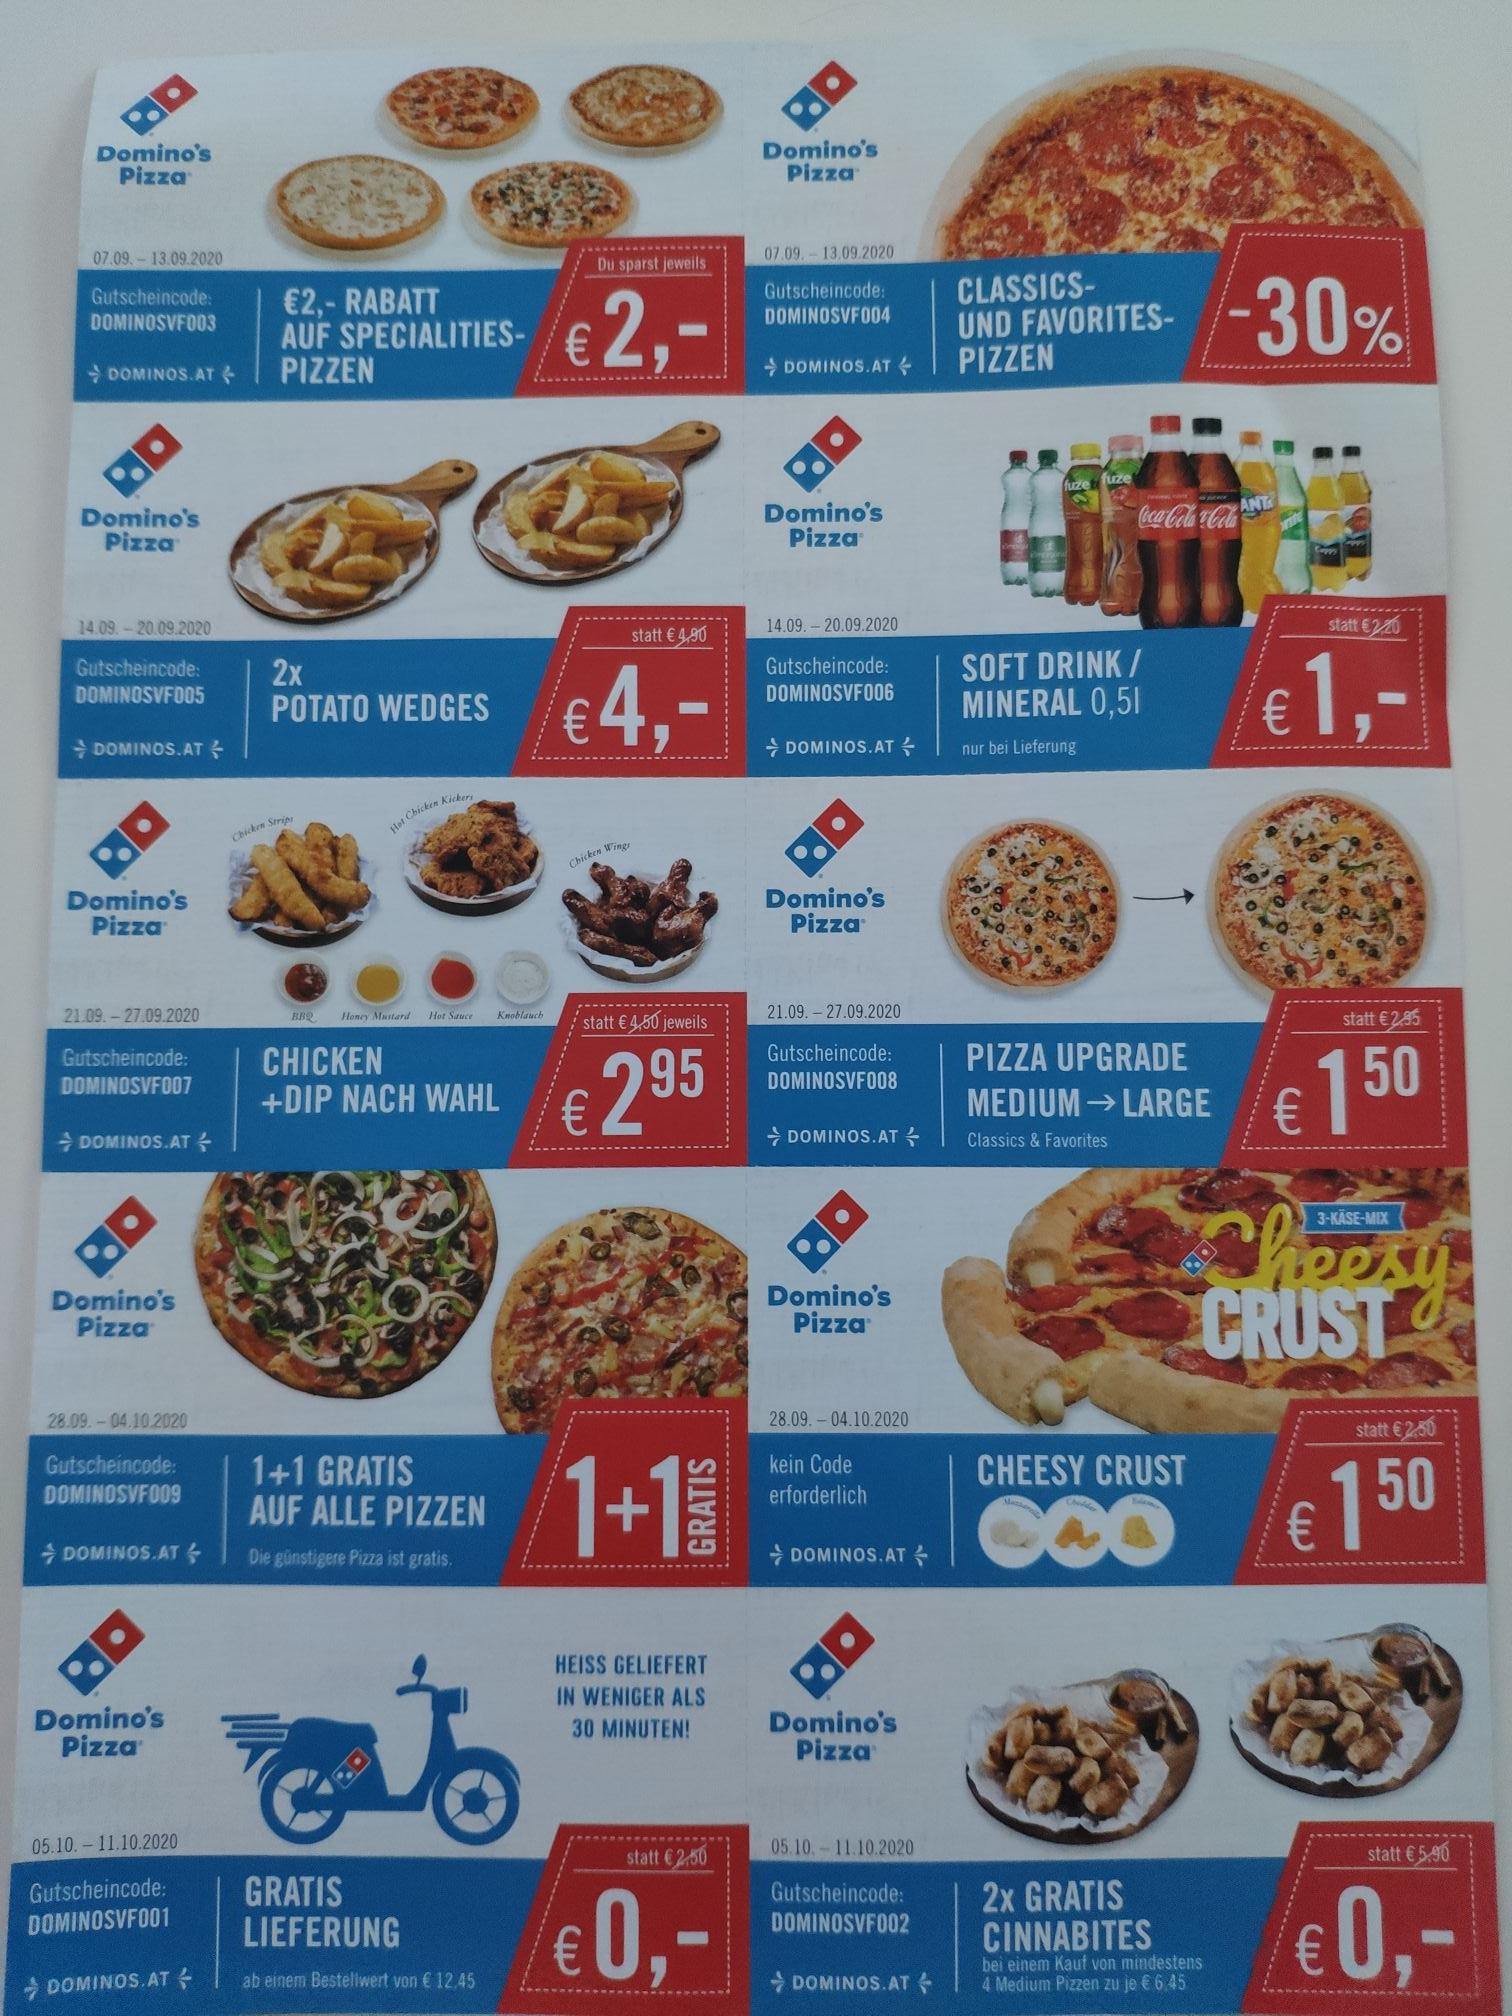 Dominos Pizza 1+1 Gratis, Gratis Lieferung, etc...